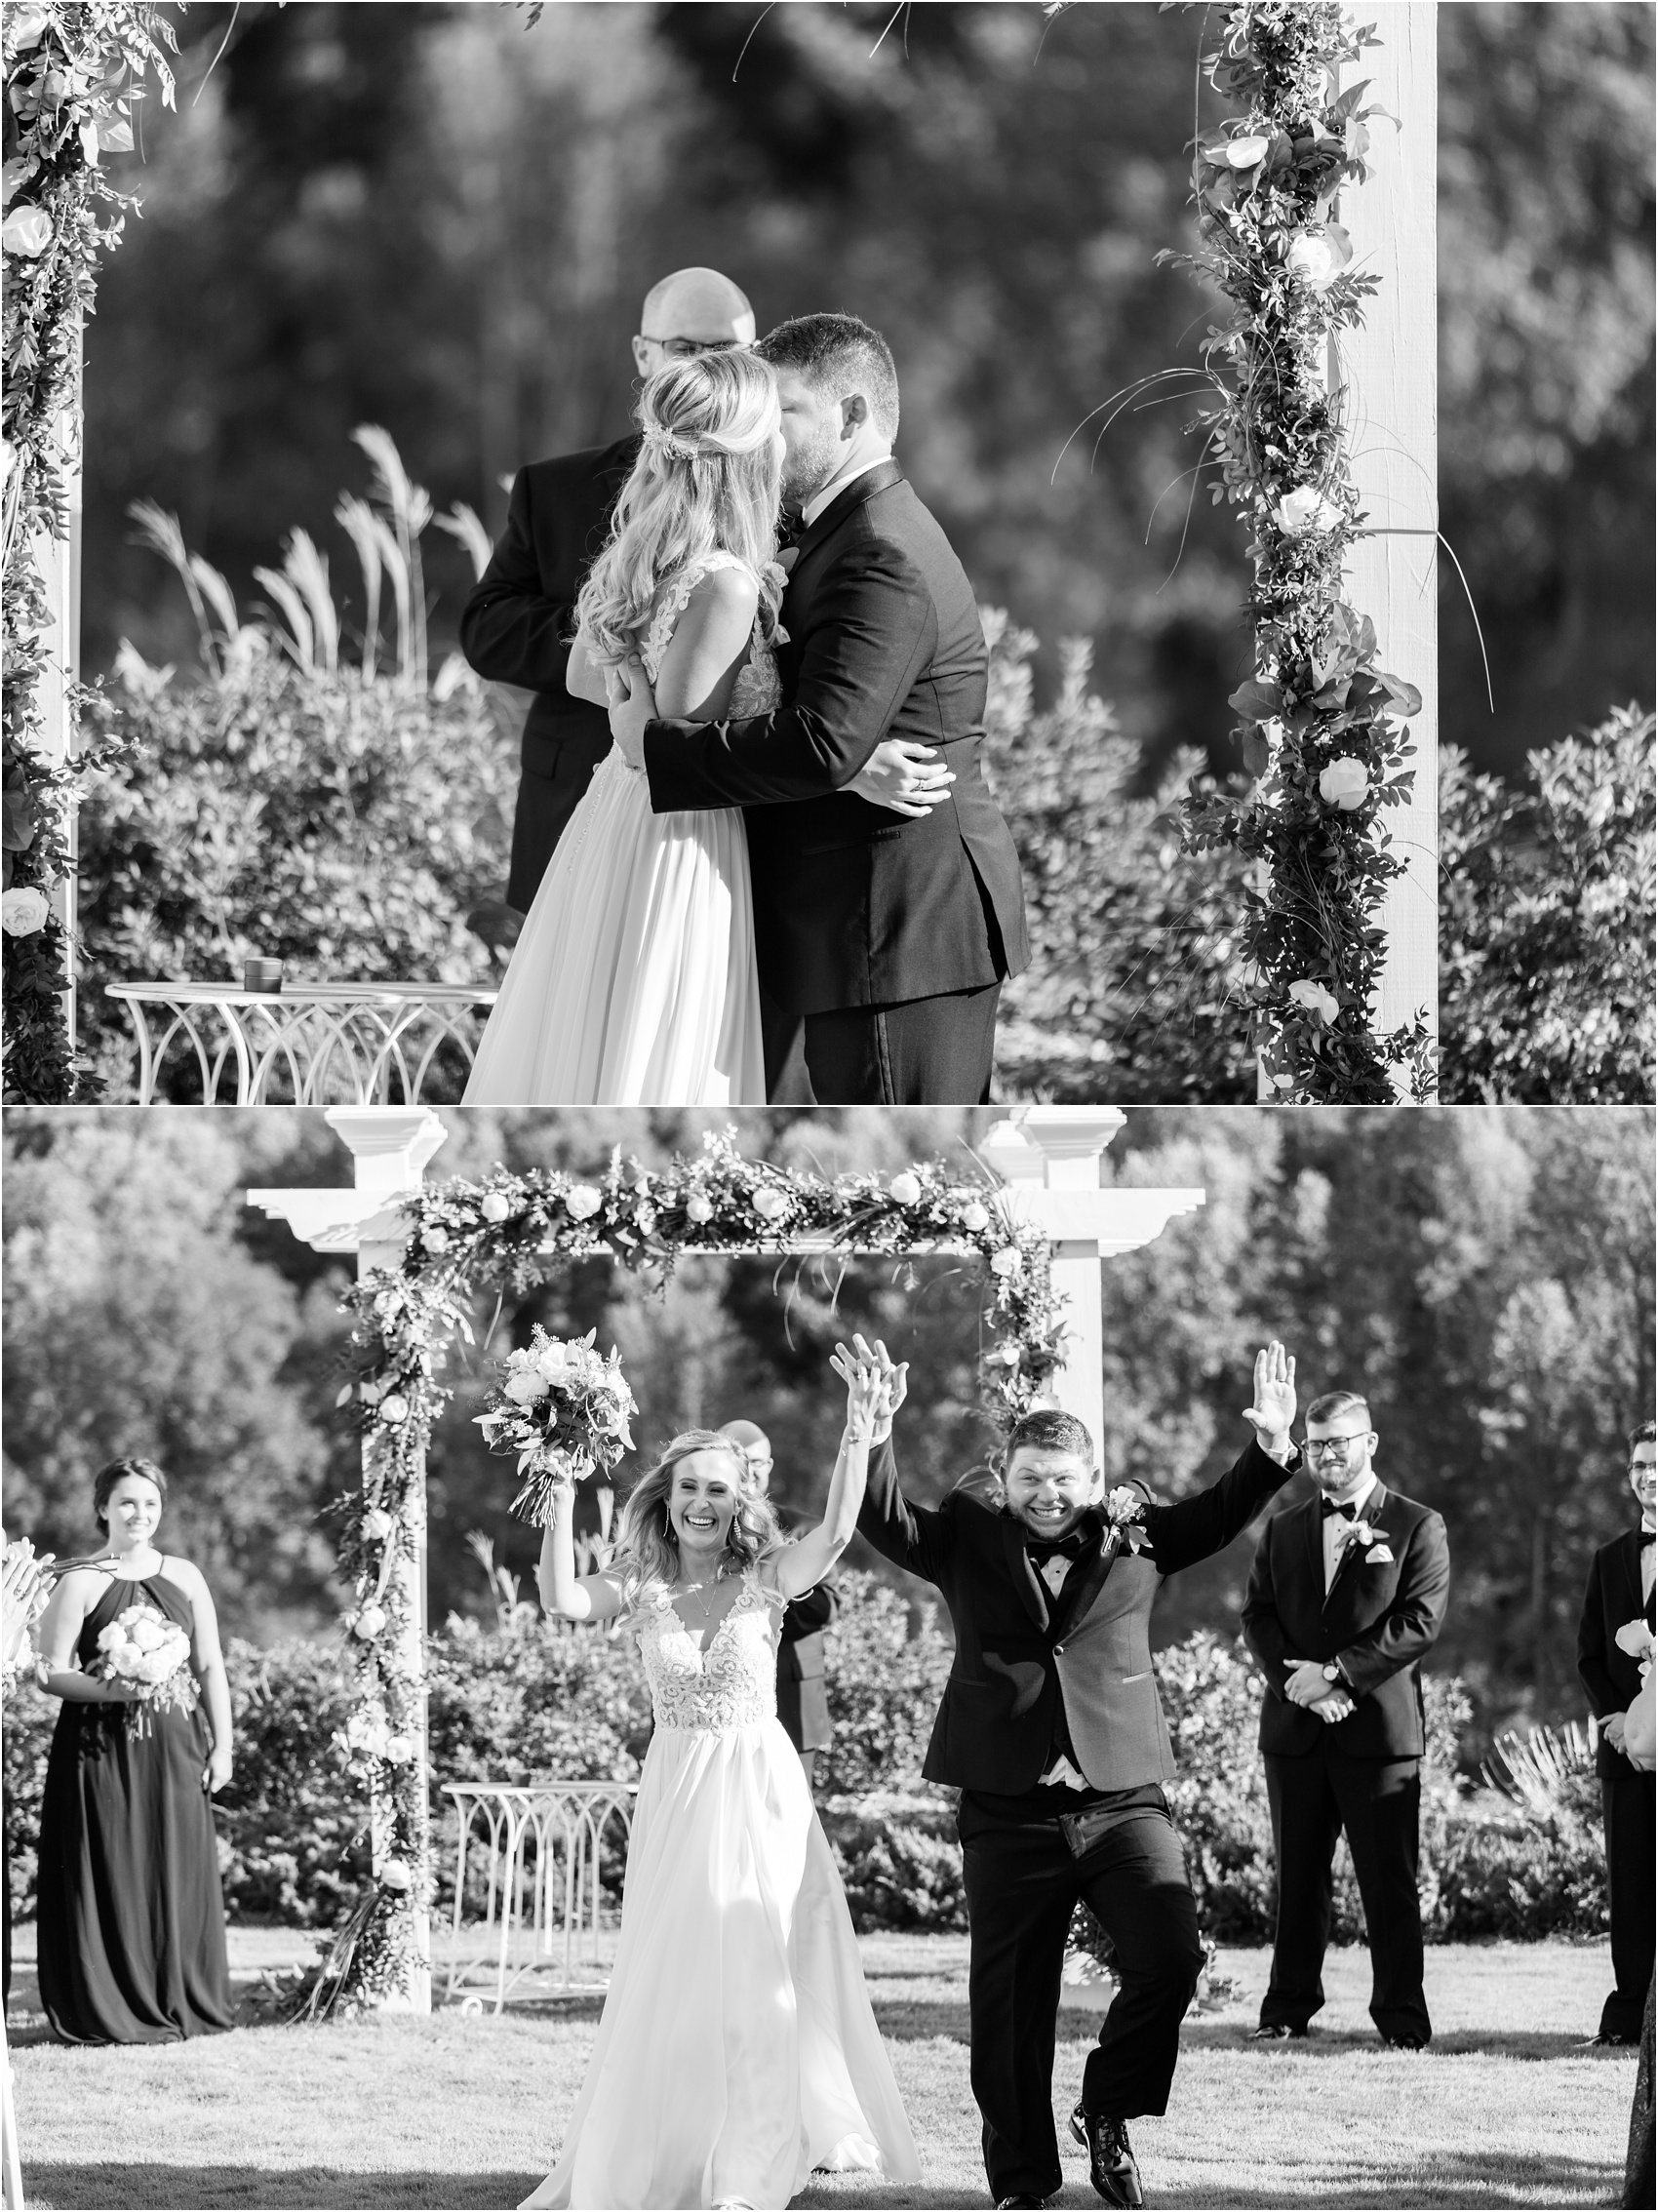 Savannah Eve Photography- Jurek-Woodworth Wedding- Sneak Peek-44.jpg